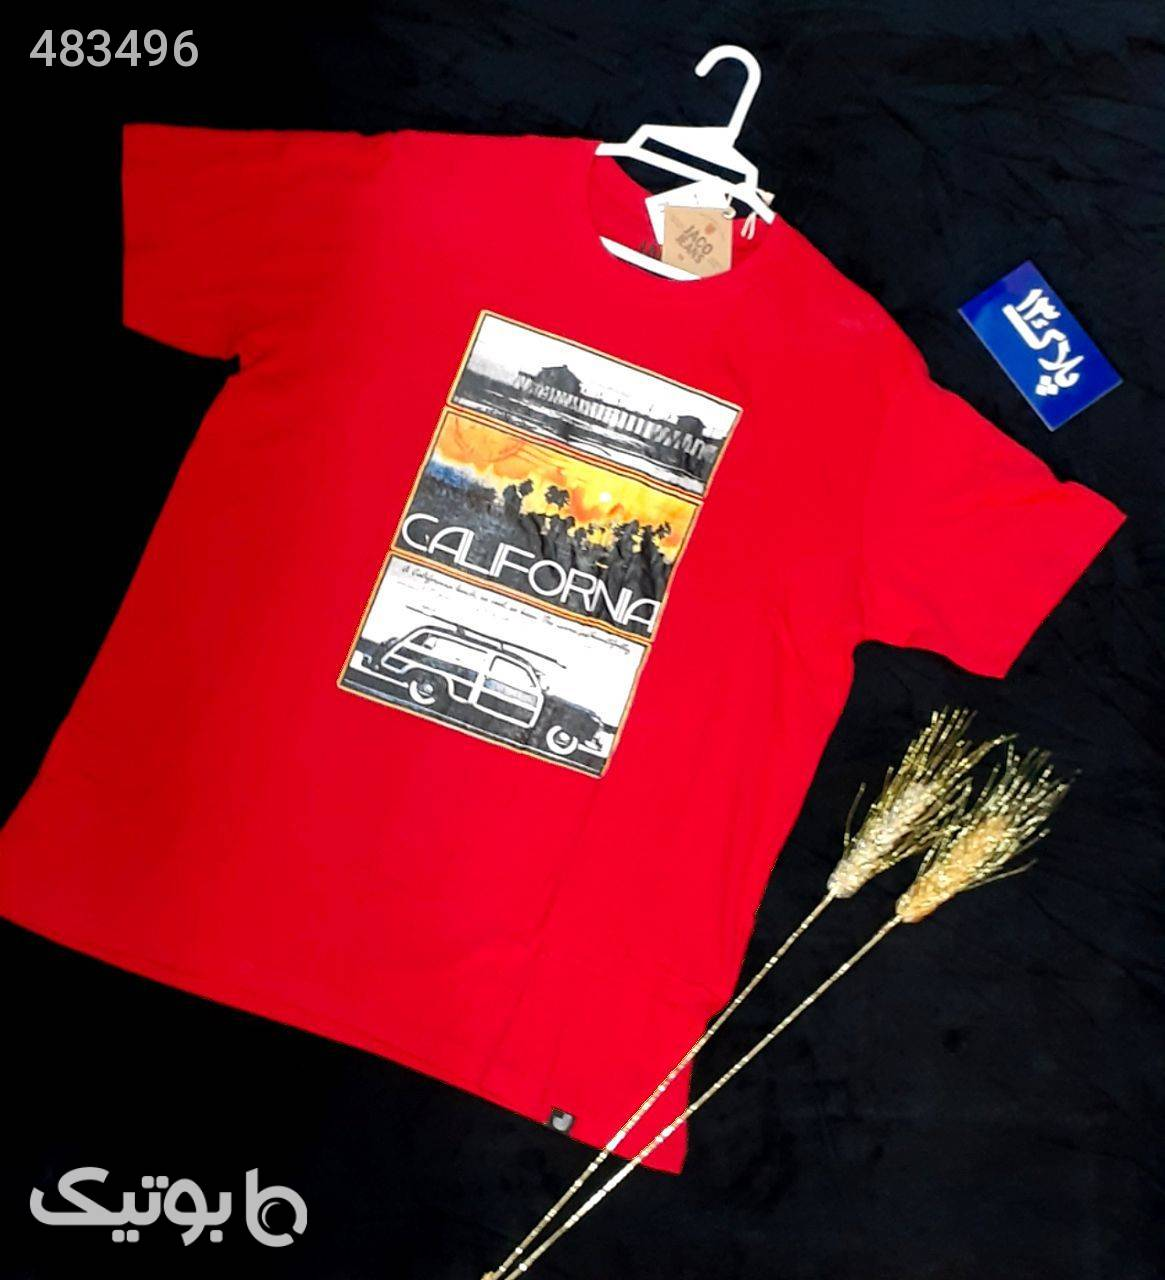 تیشرت  قرمز تی شرت و پولو شرت مردانه